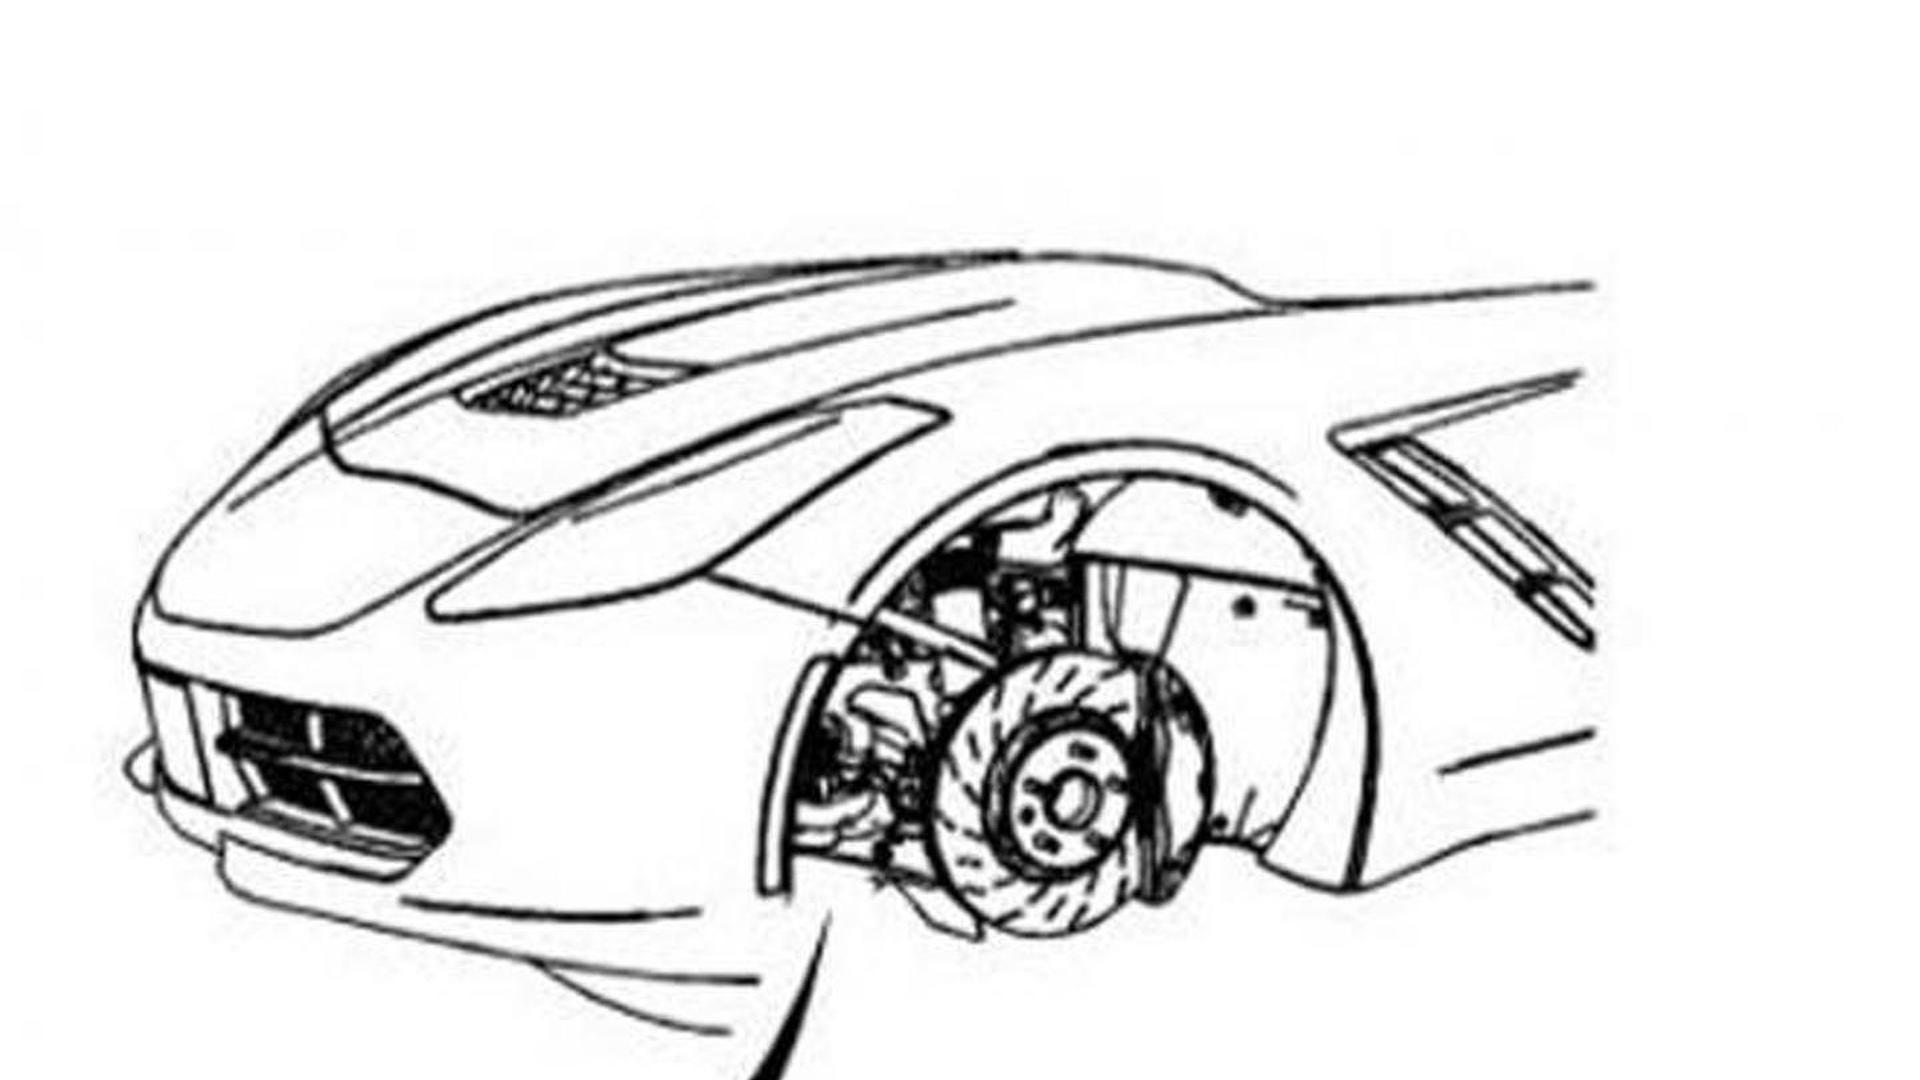 2014 Chevrolet Corvette front revealed in service manual